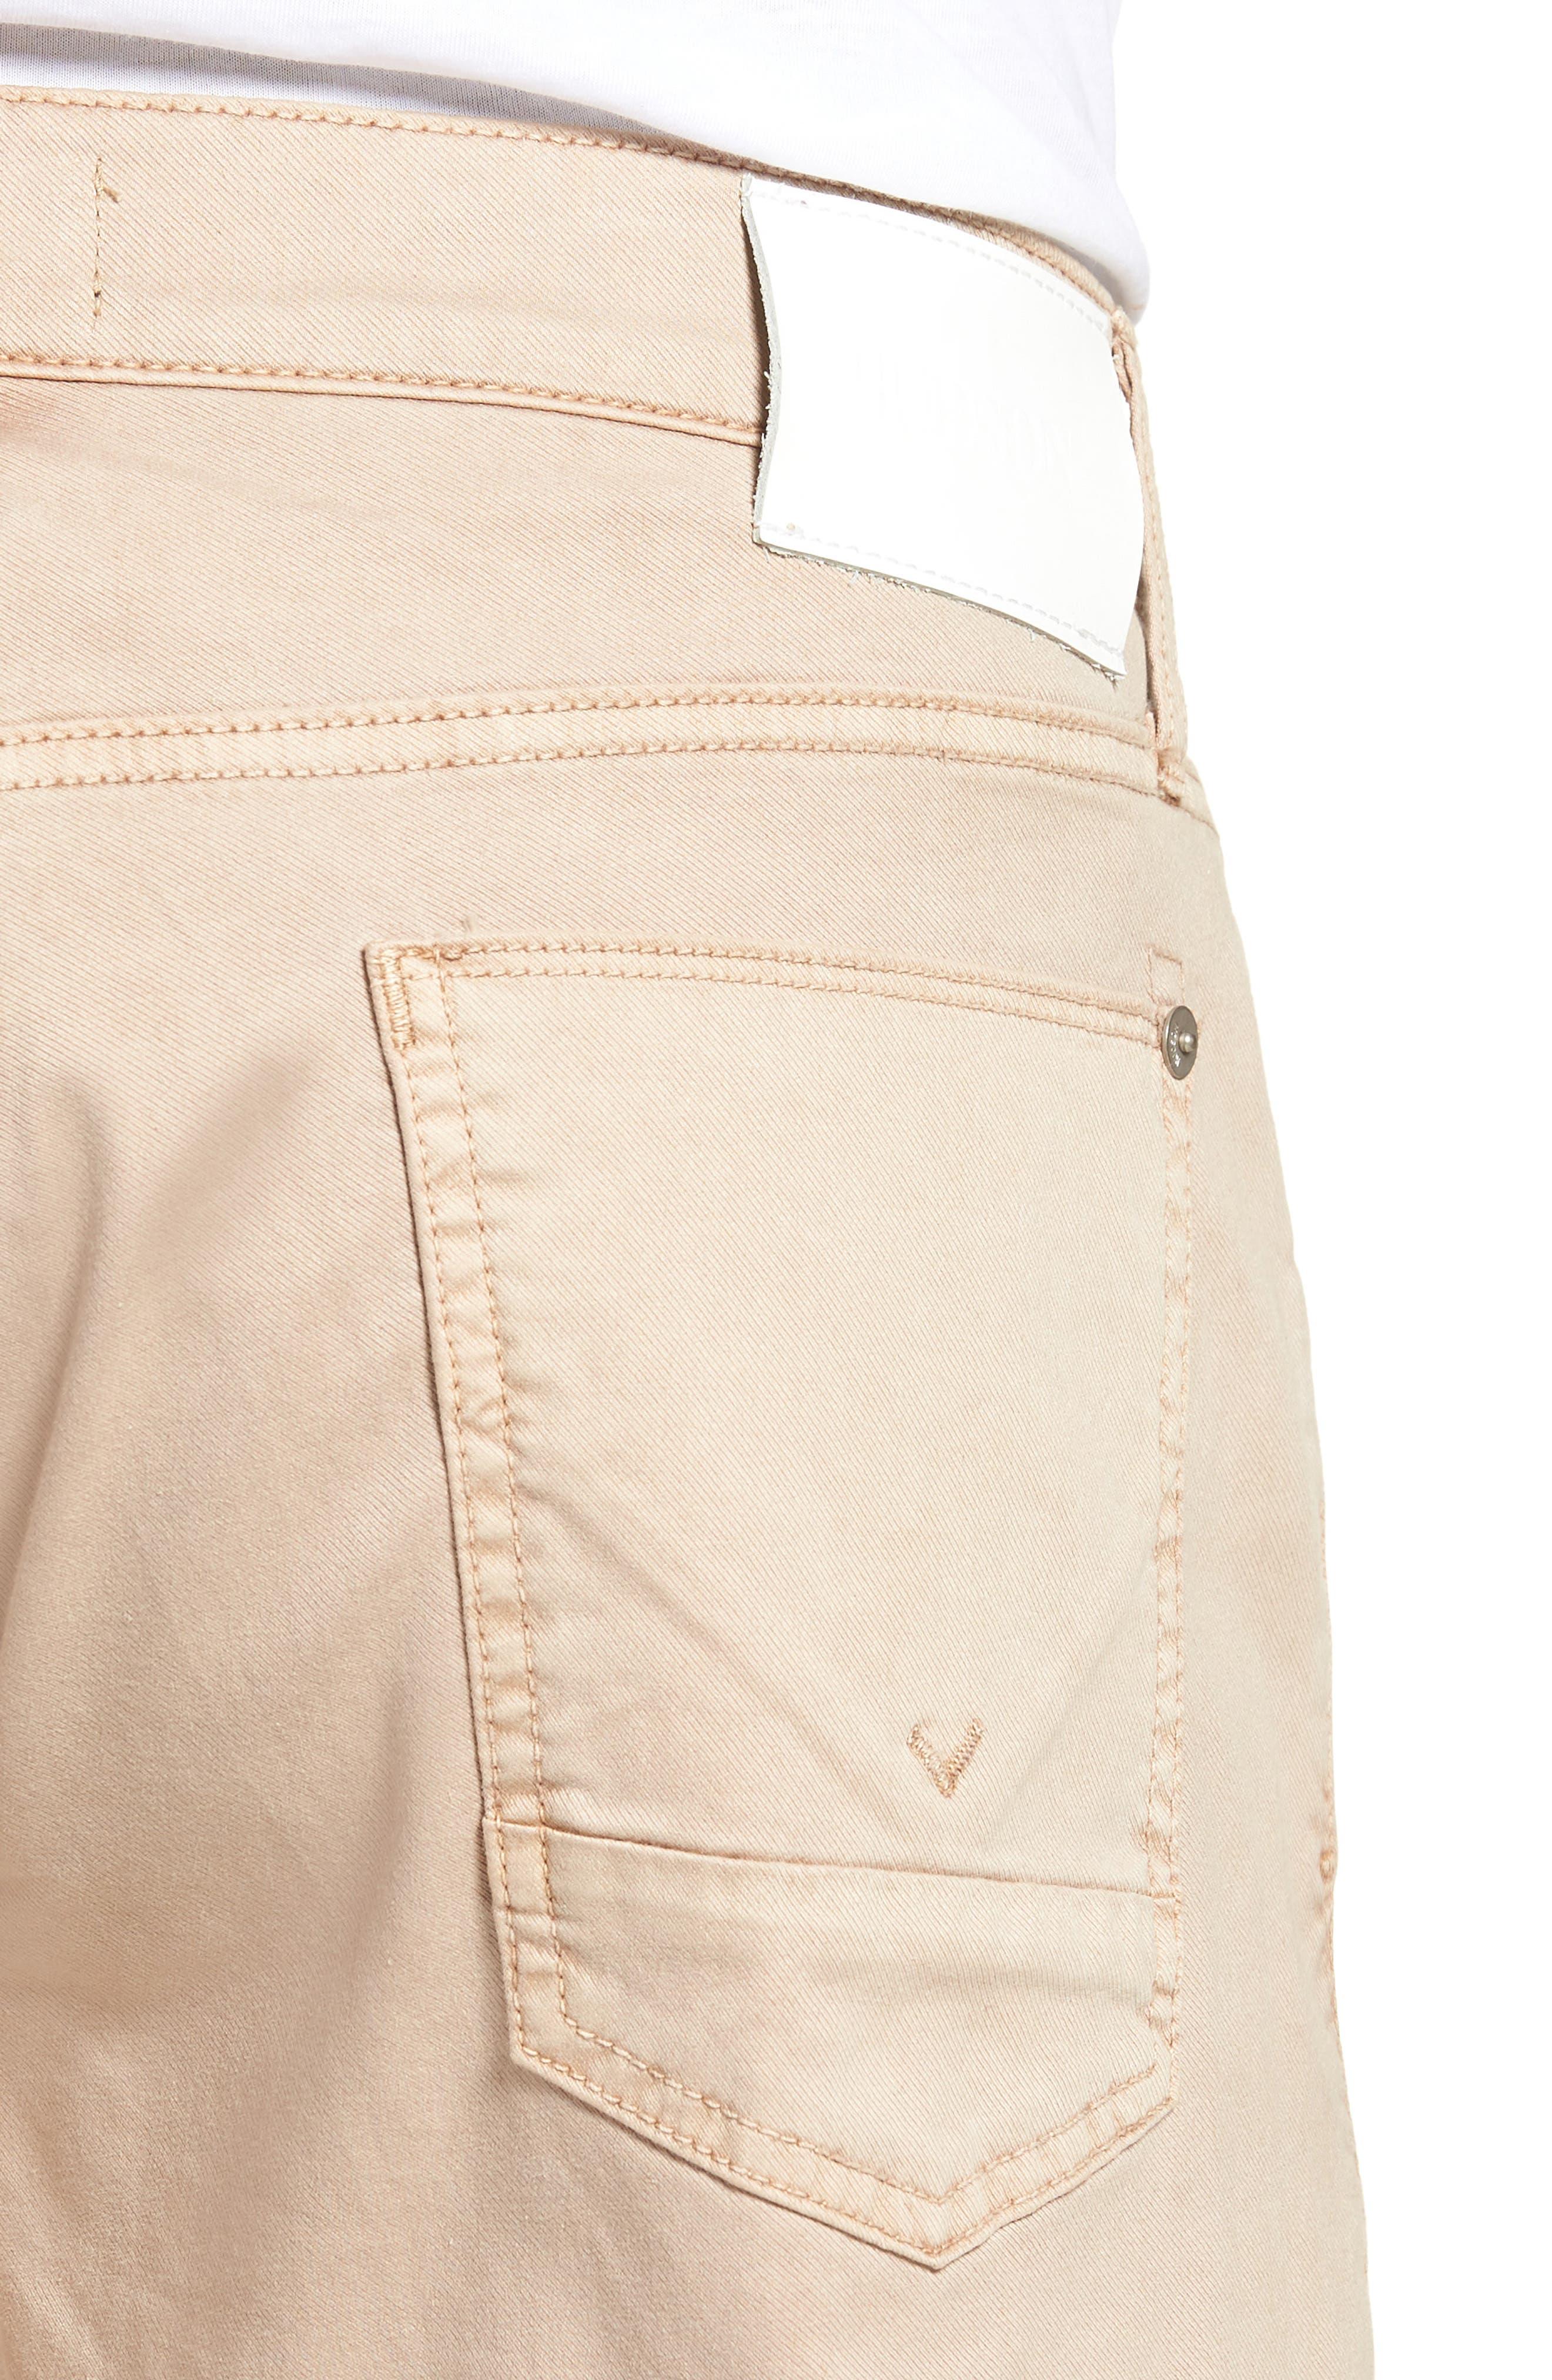 Blake Slim Fit Jeans,                             Alternate thumbnail 4, color,                             250